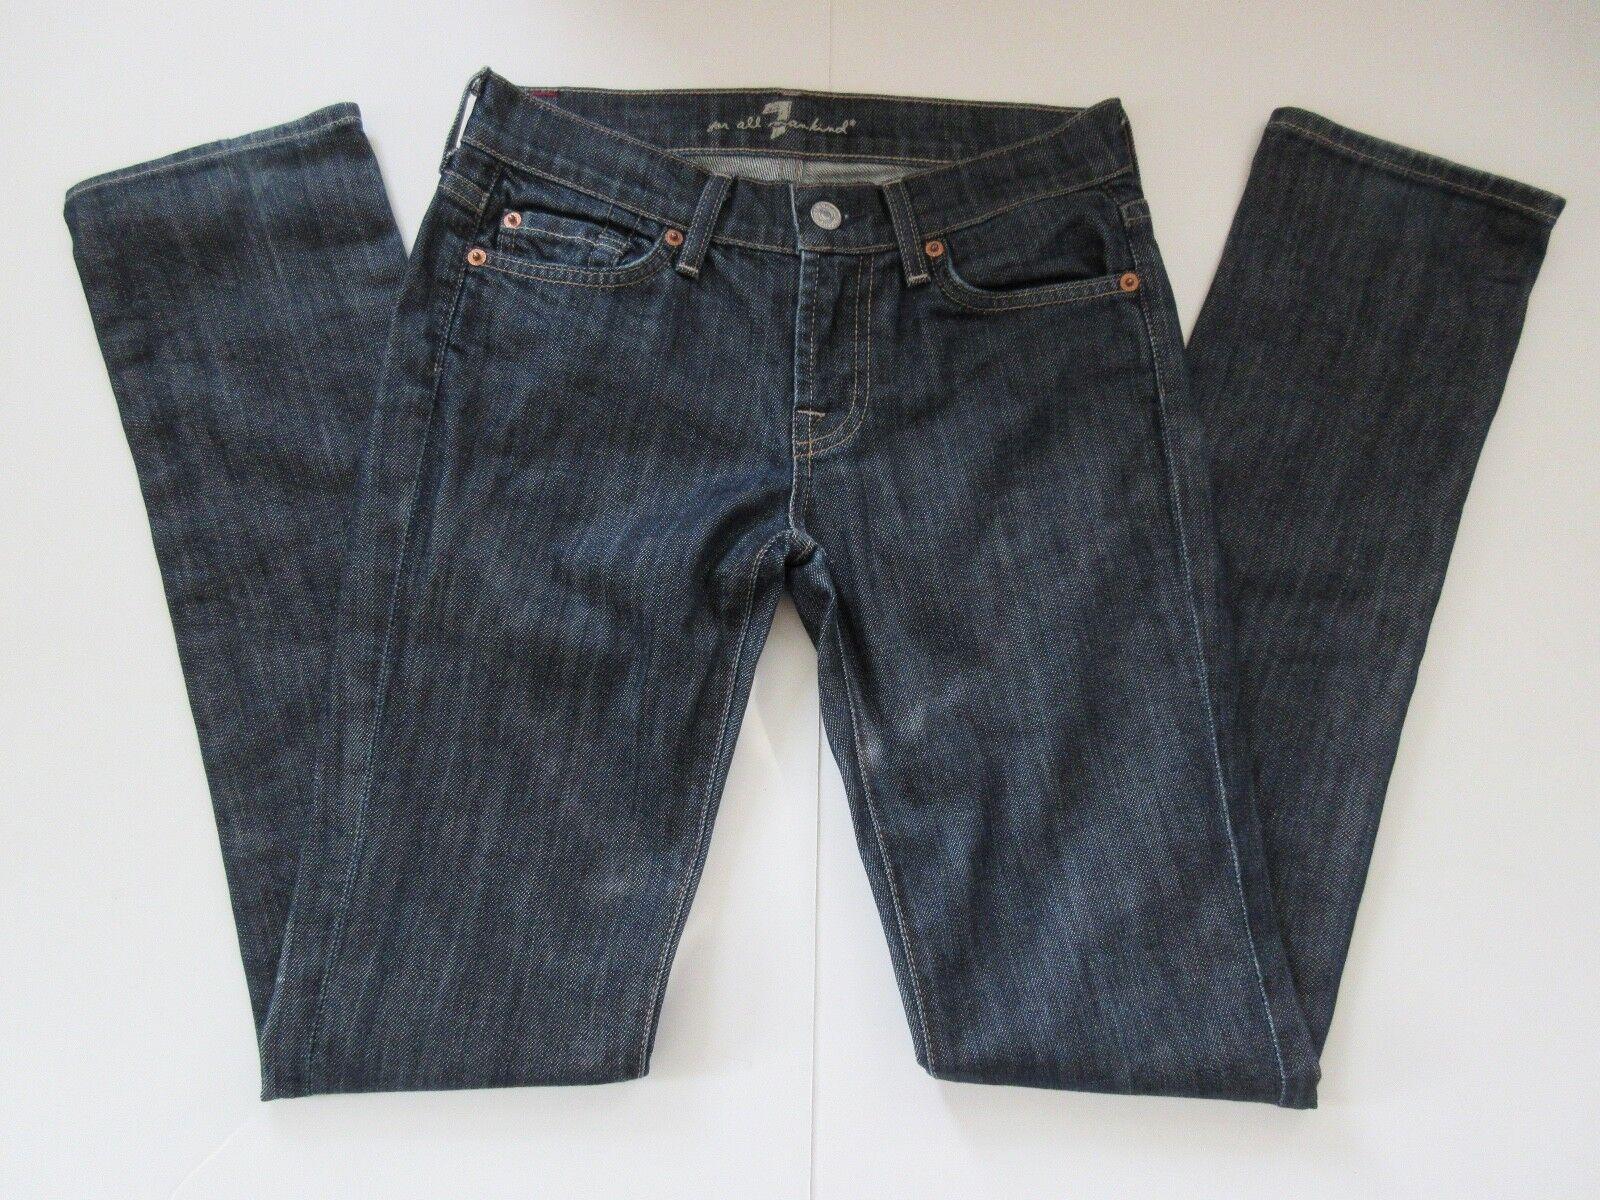 7 For All Mankind Roxanne P179080U-080U Cut 712698 Dark Wash Jeans, Size 25x32